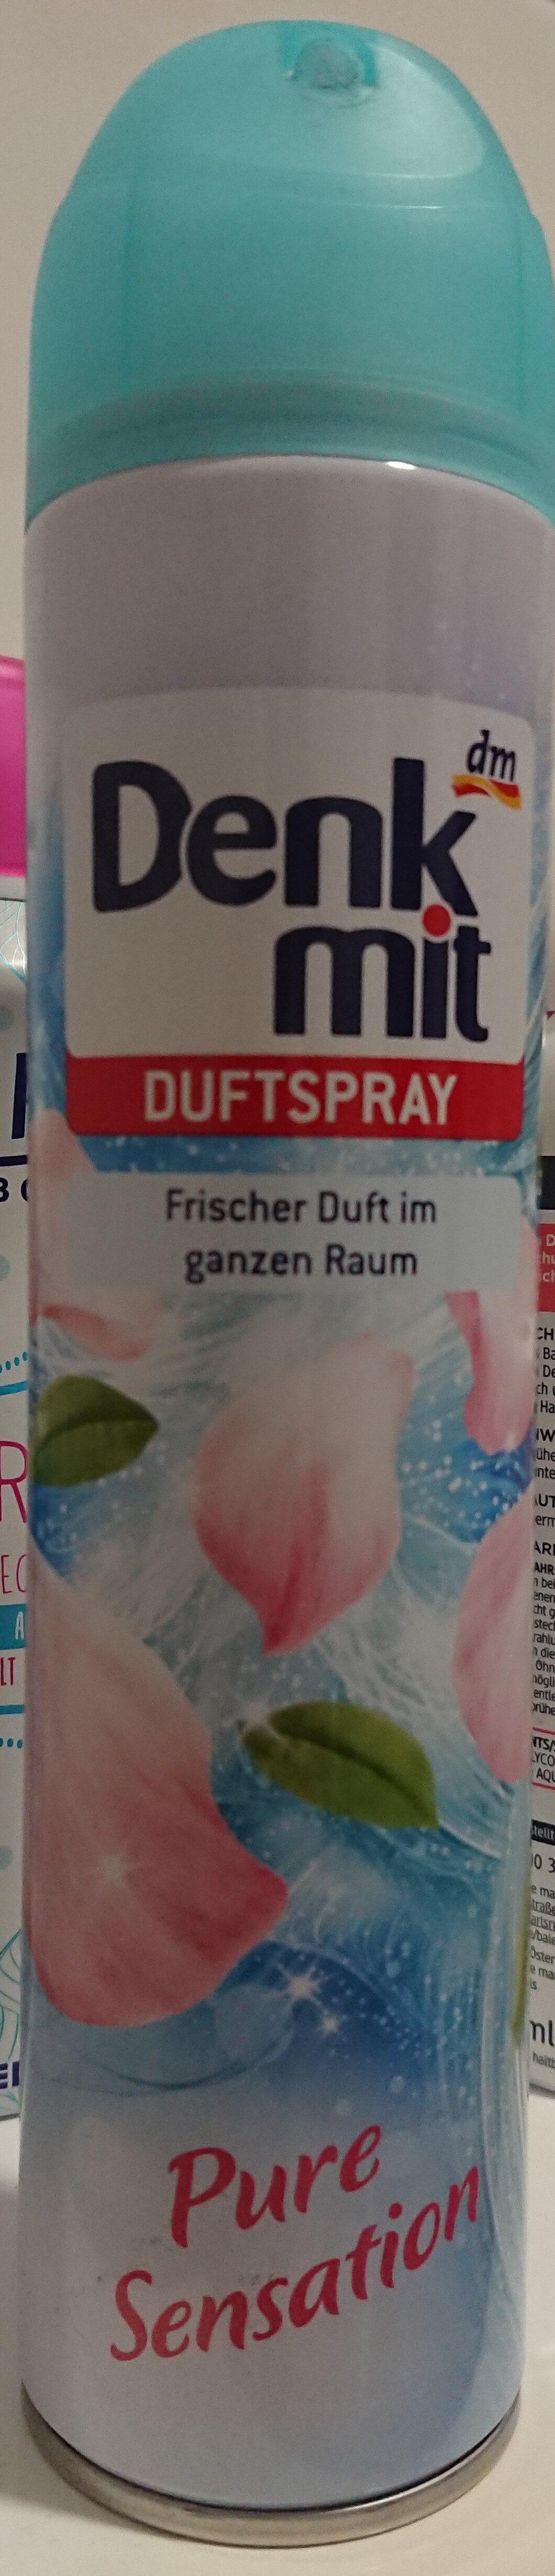 Denkmit Duftspray Pure Sansarion - Product - de